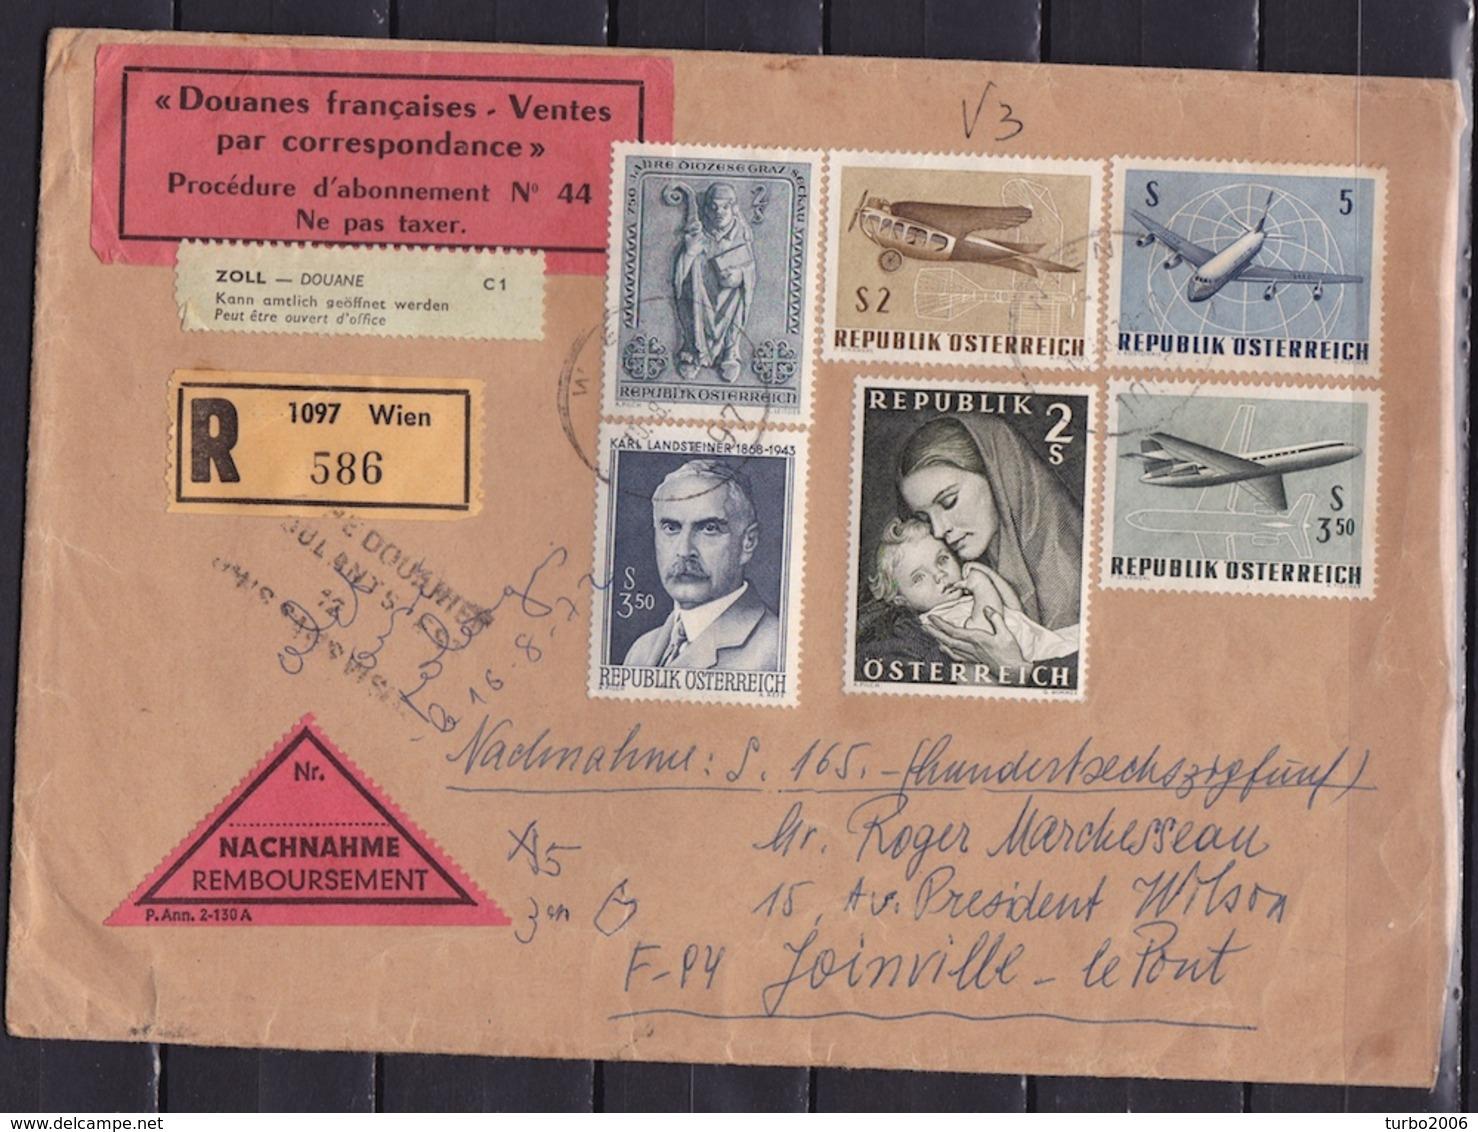 "DOUANE 1972 Nachnahme-cover From Austria With Custom Labels ""Douanes Franceises-Ventes Par Correspondence"" + C 1 - Andere"